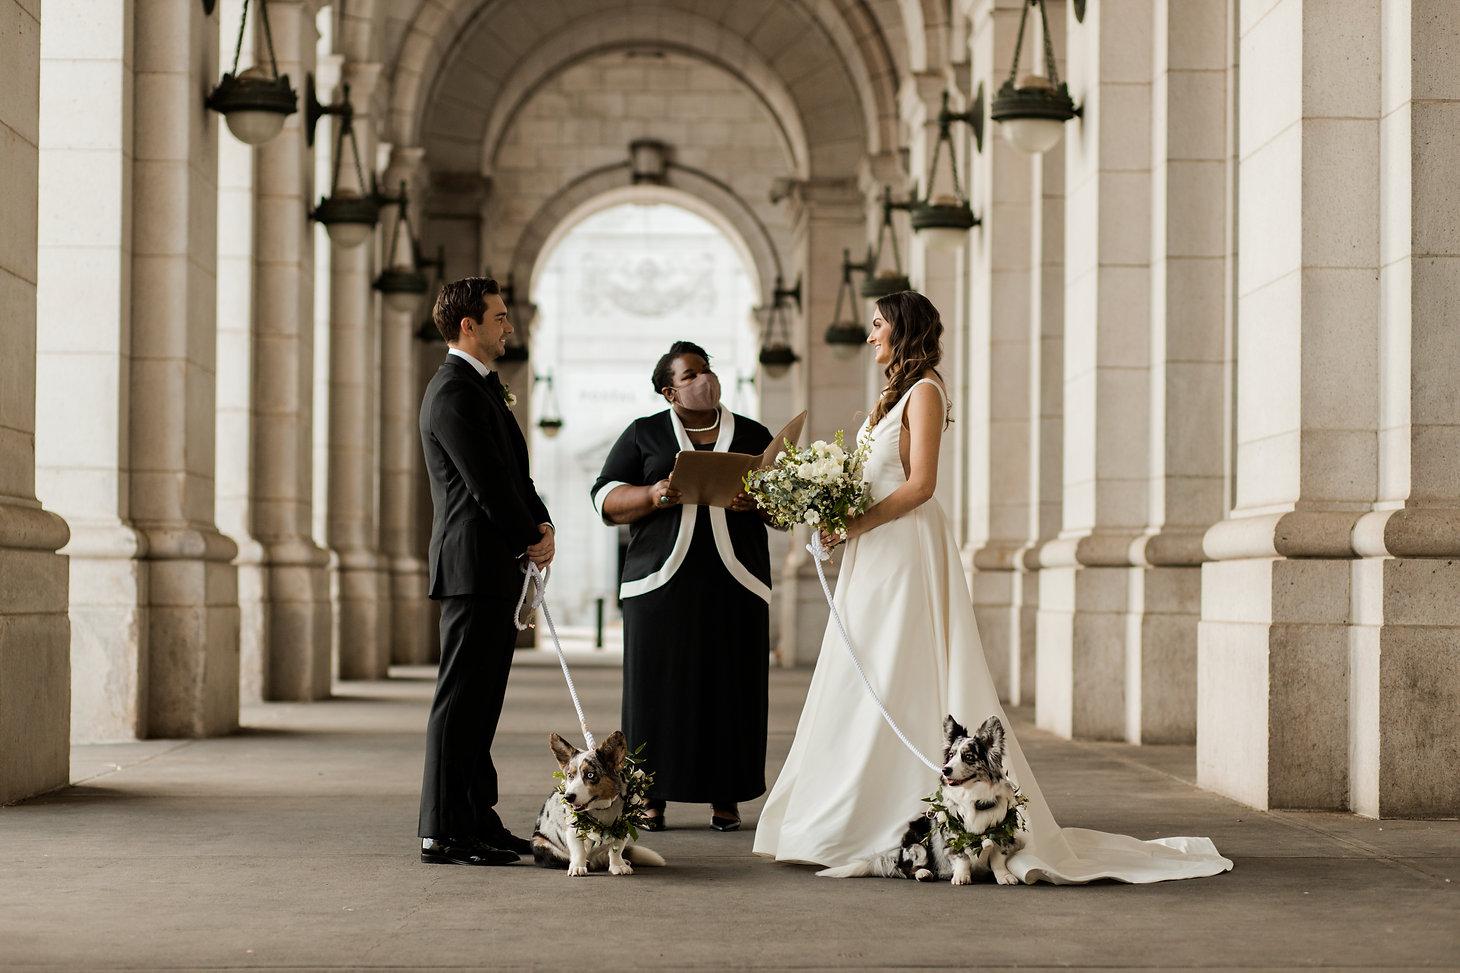 05142021-WASHINGTONDC-UNIONSTATION-ALEXANDZACH- ANDREASALAZARPHOTOGRAPHY